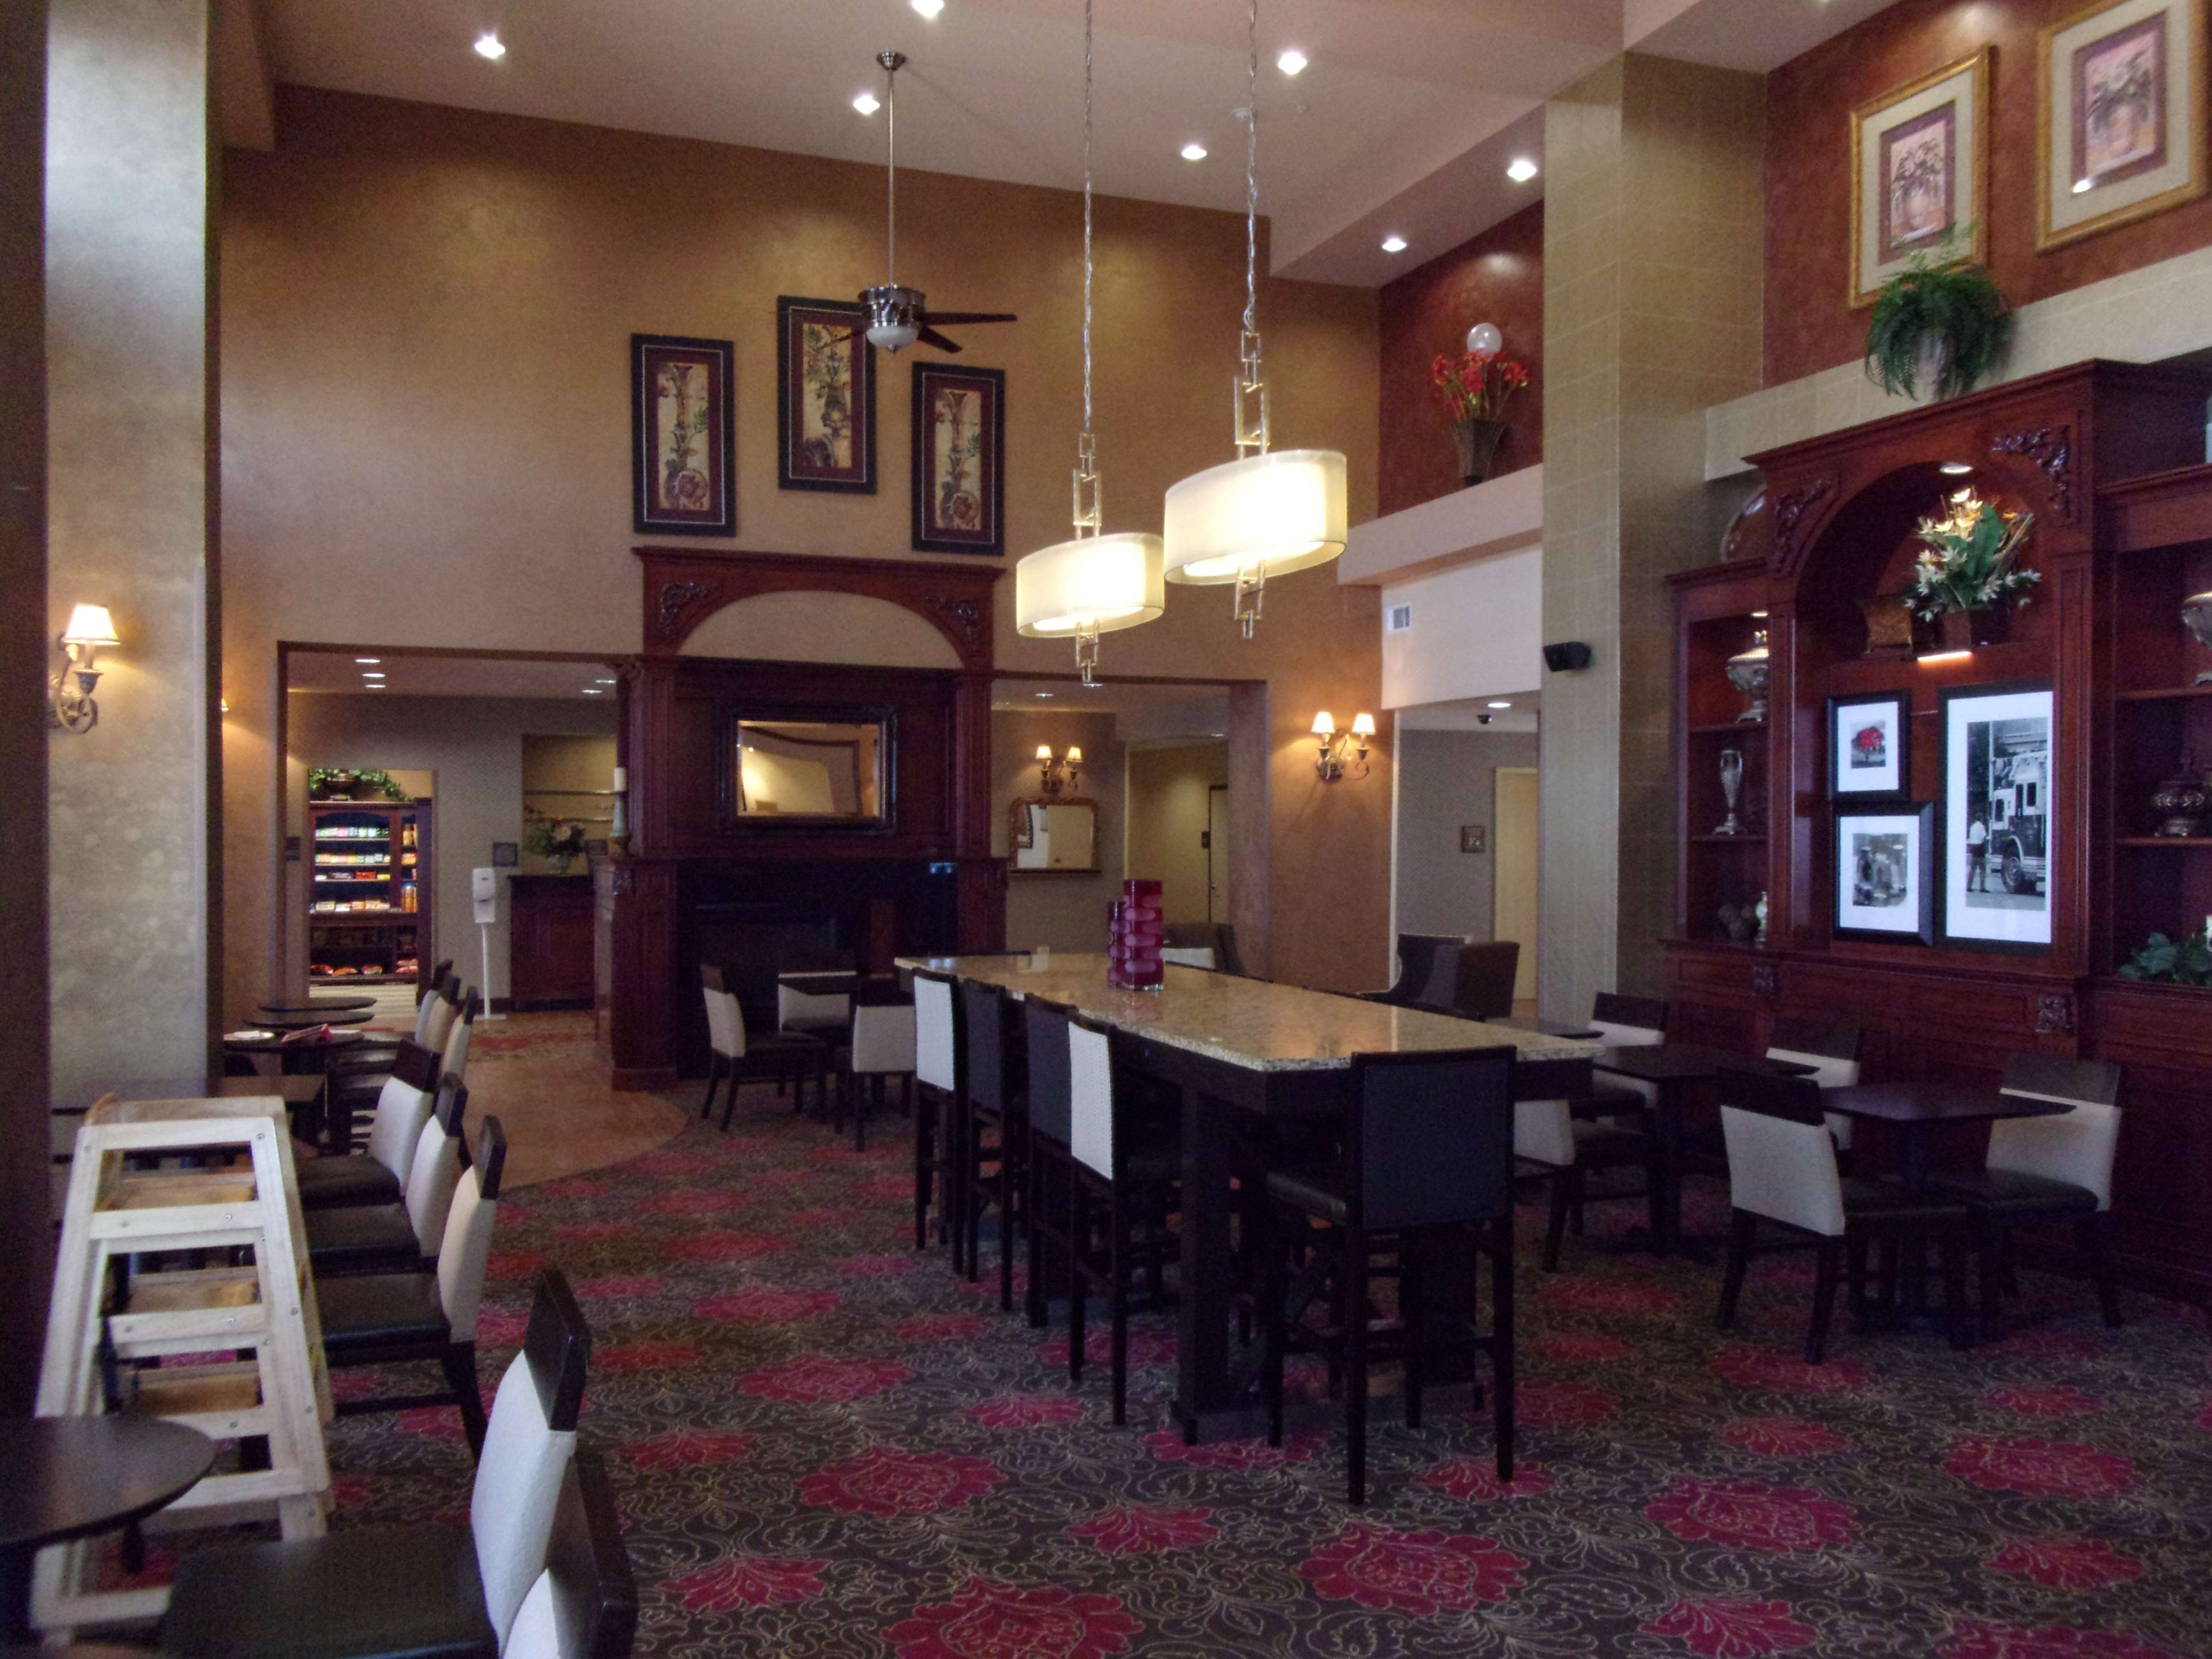 Hampton Inn & Suites Bolingbrook image 0